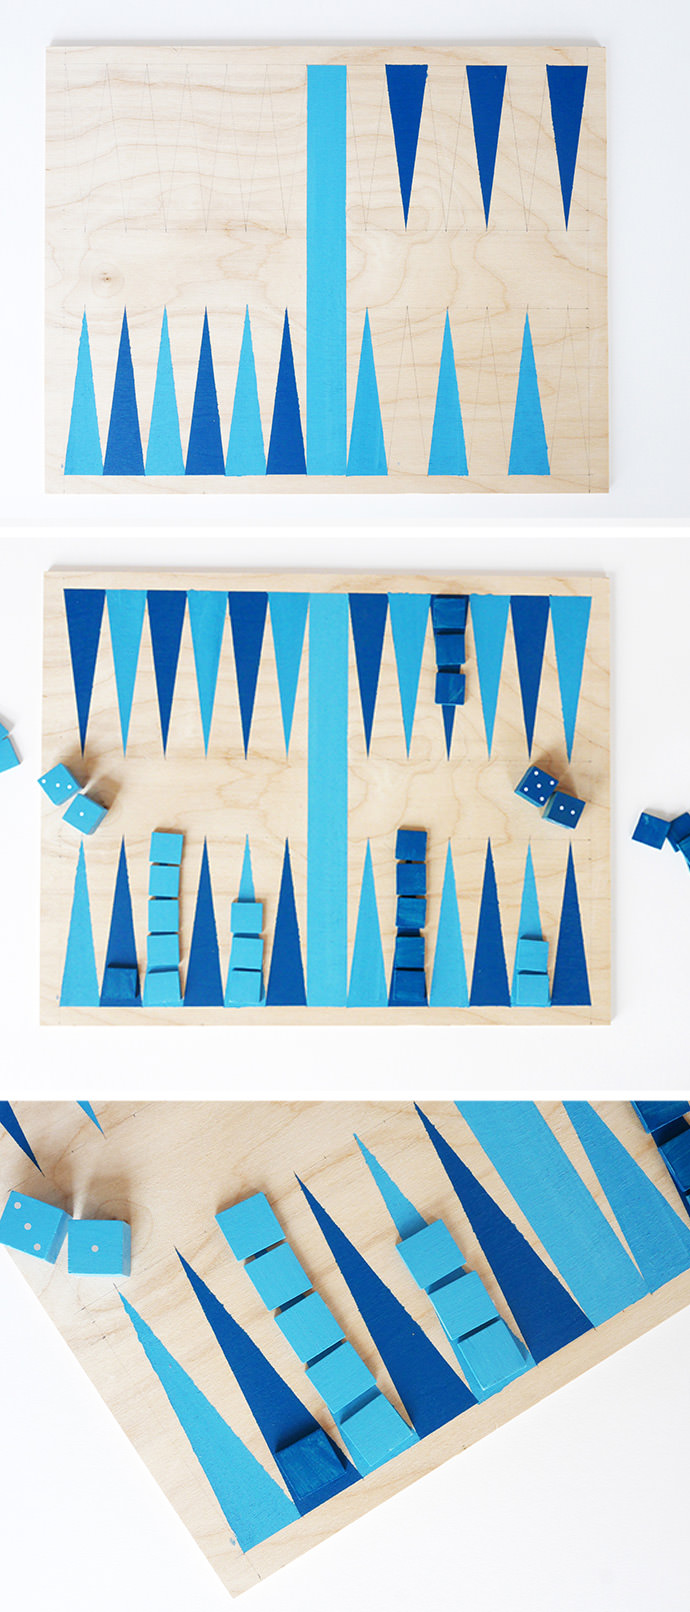 diy backgammon game - Backgammon Game